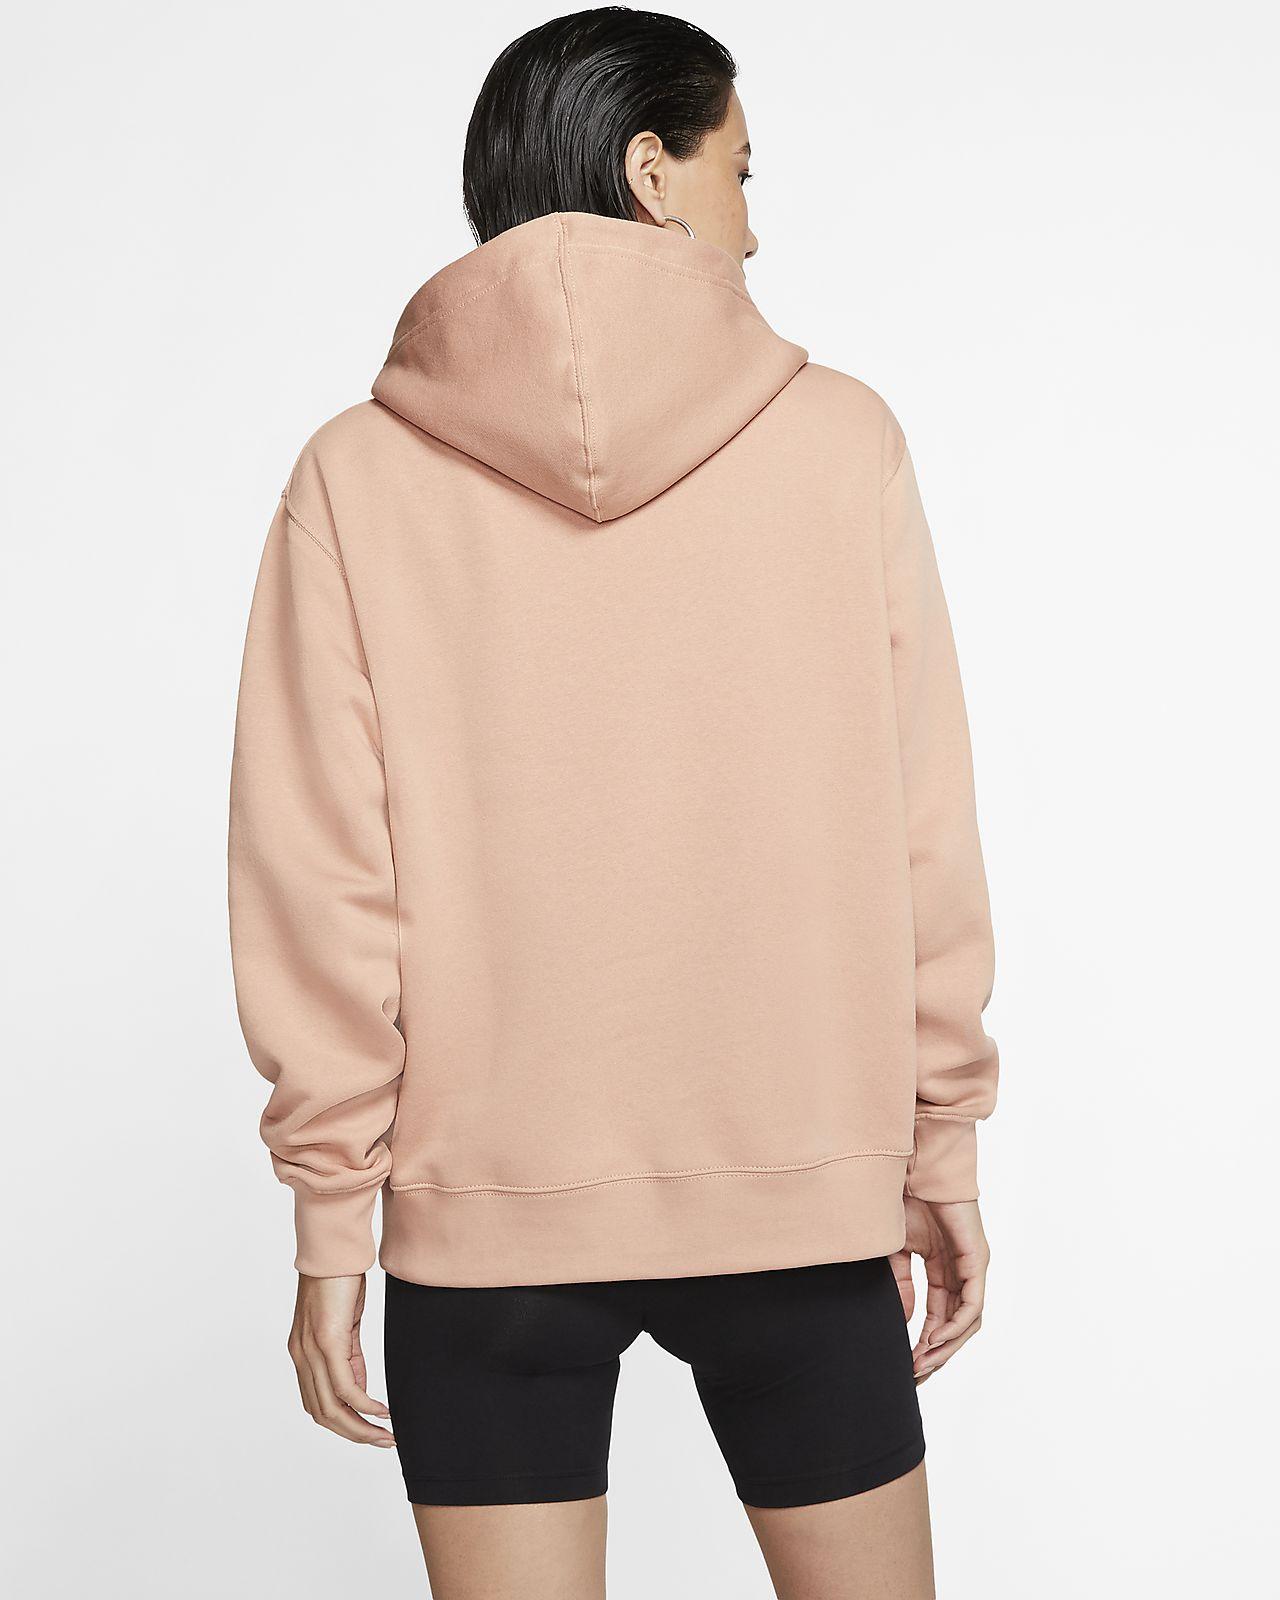 nike hoodie oversize femme